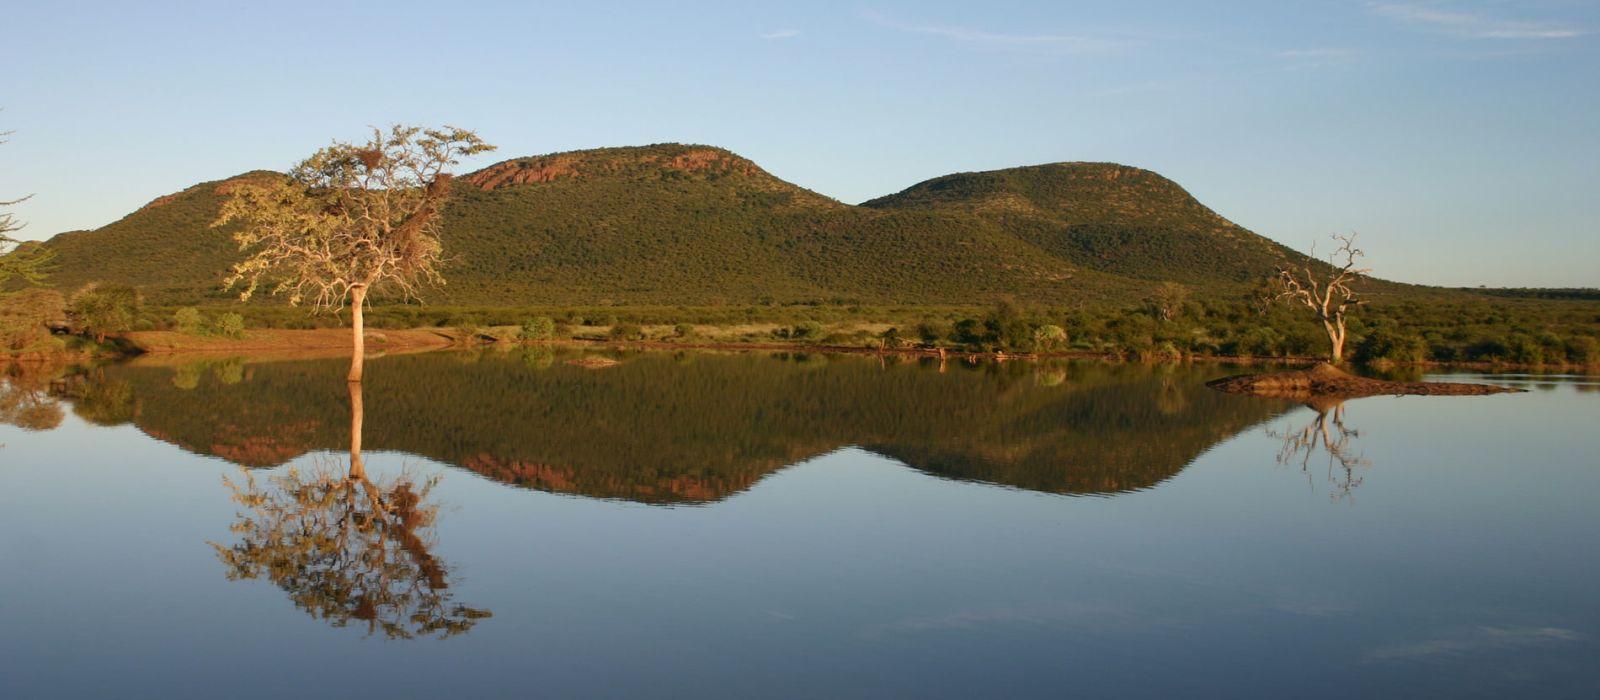 Destination Madikwe South Africa